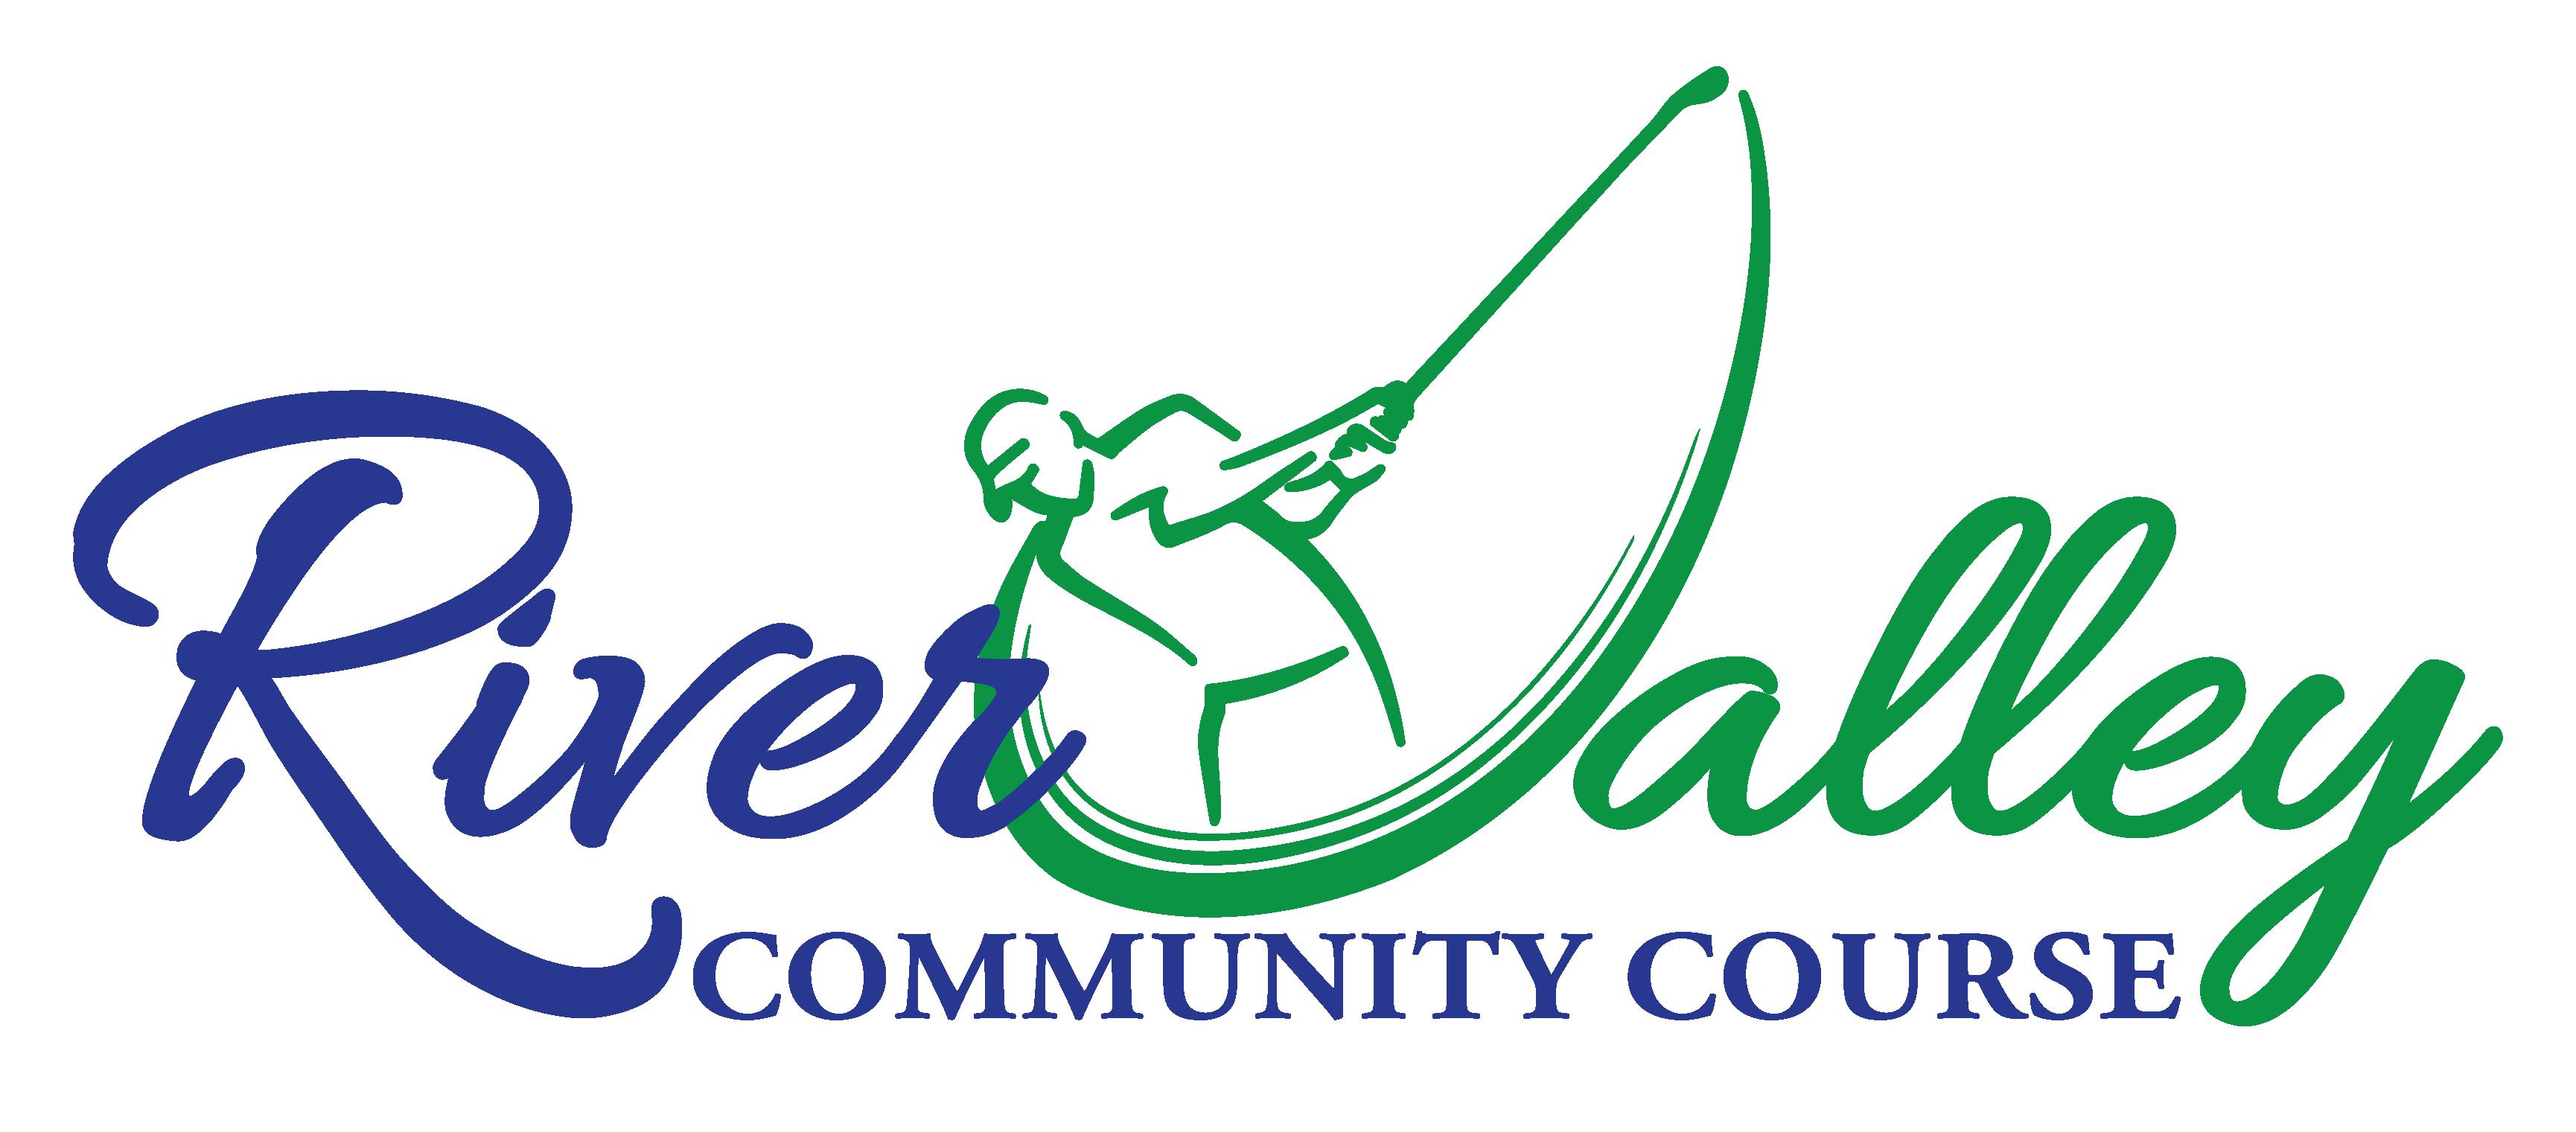 River Valley Community